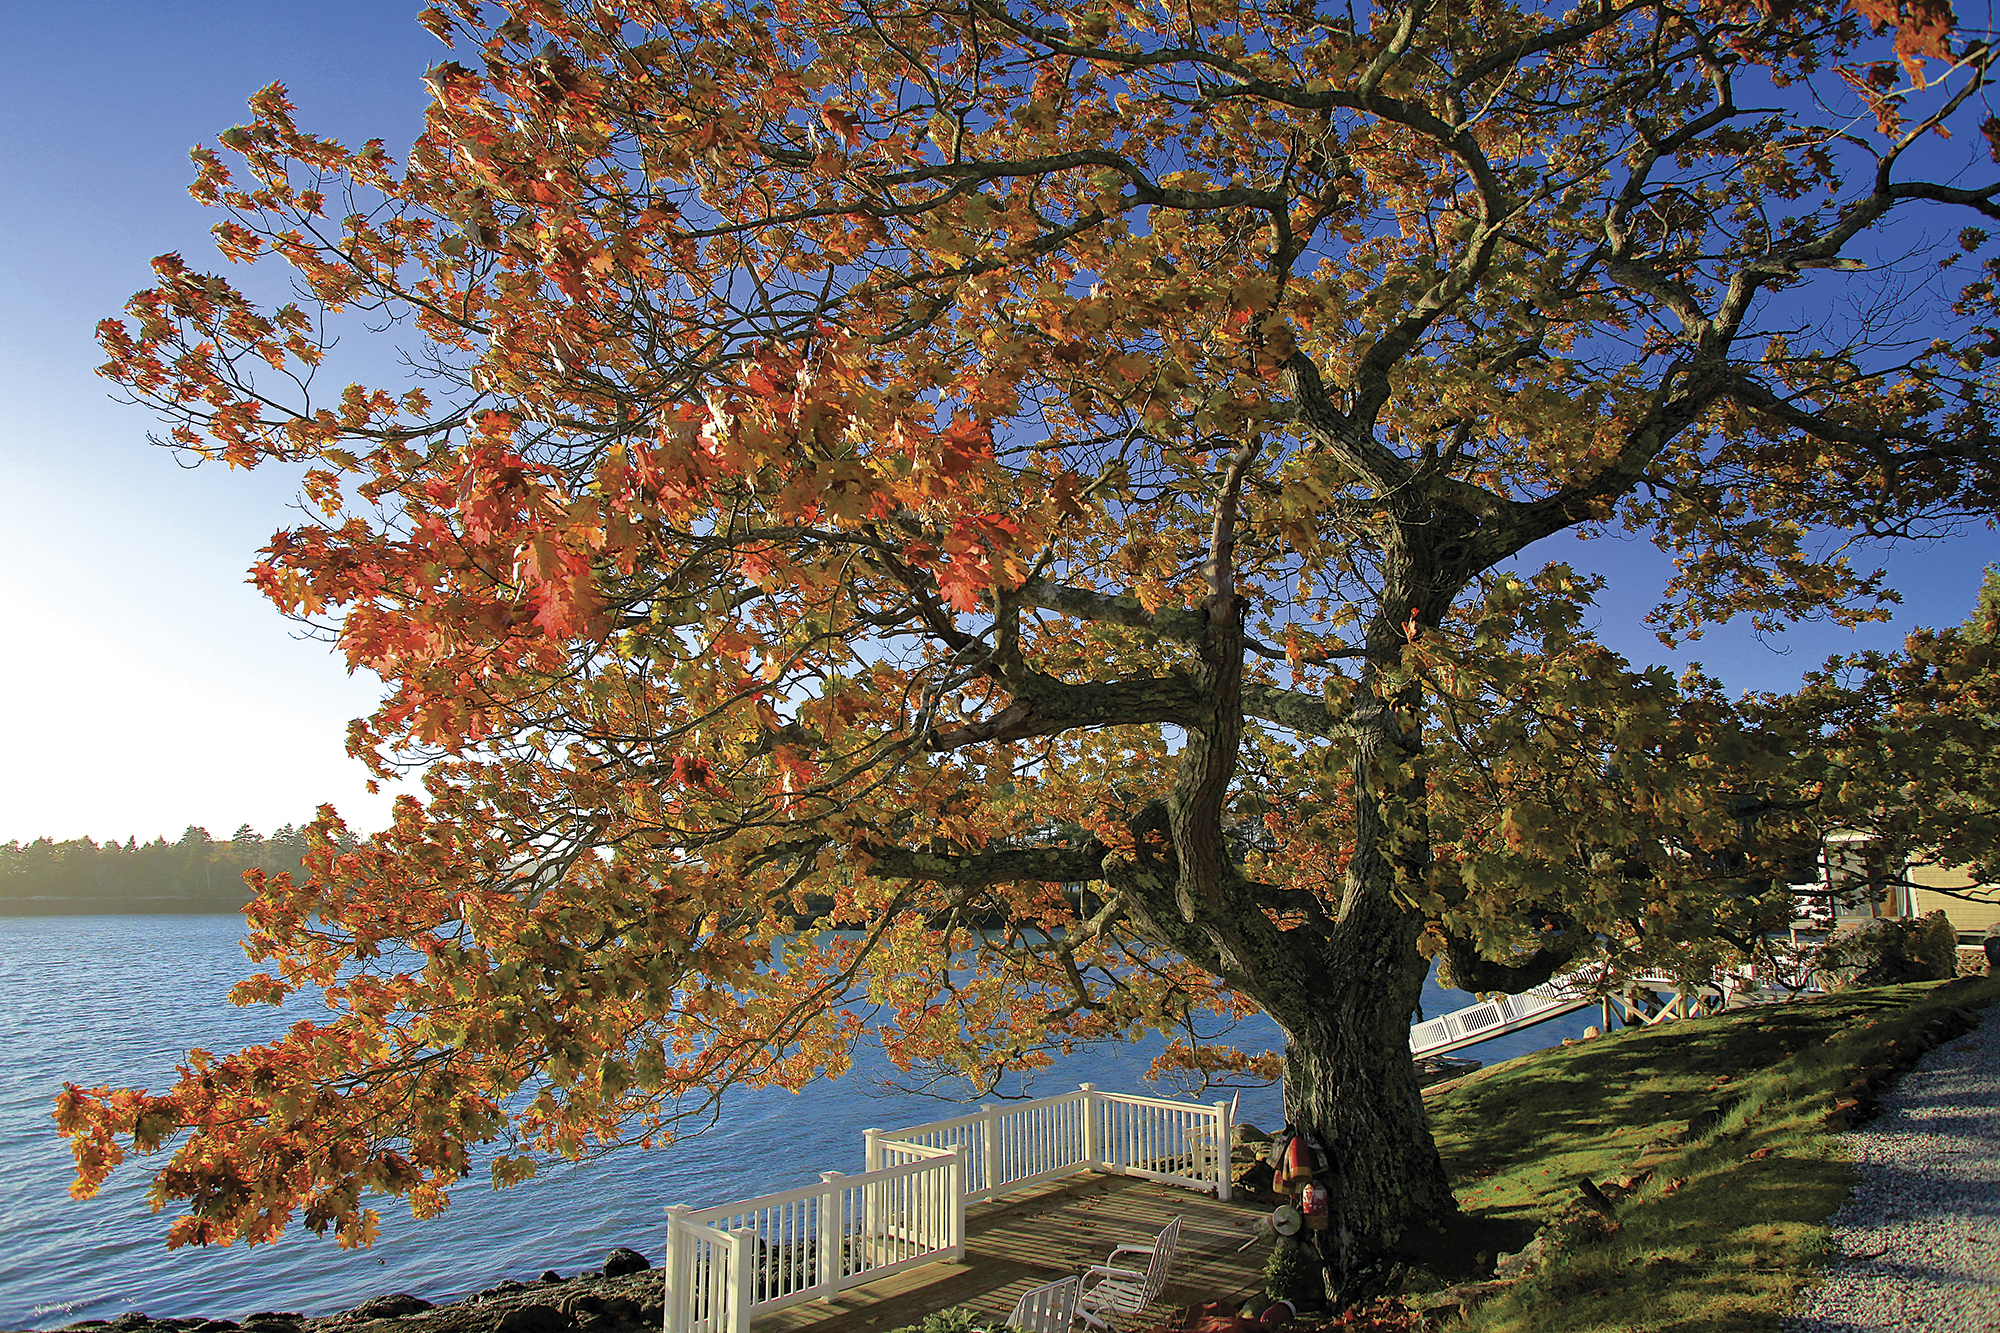 November: Sawyer's Island